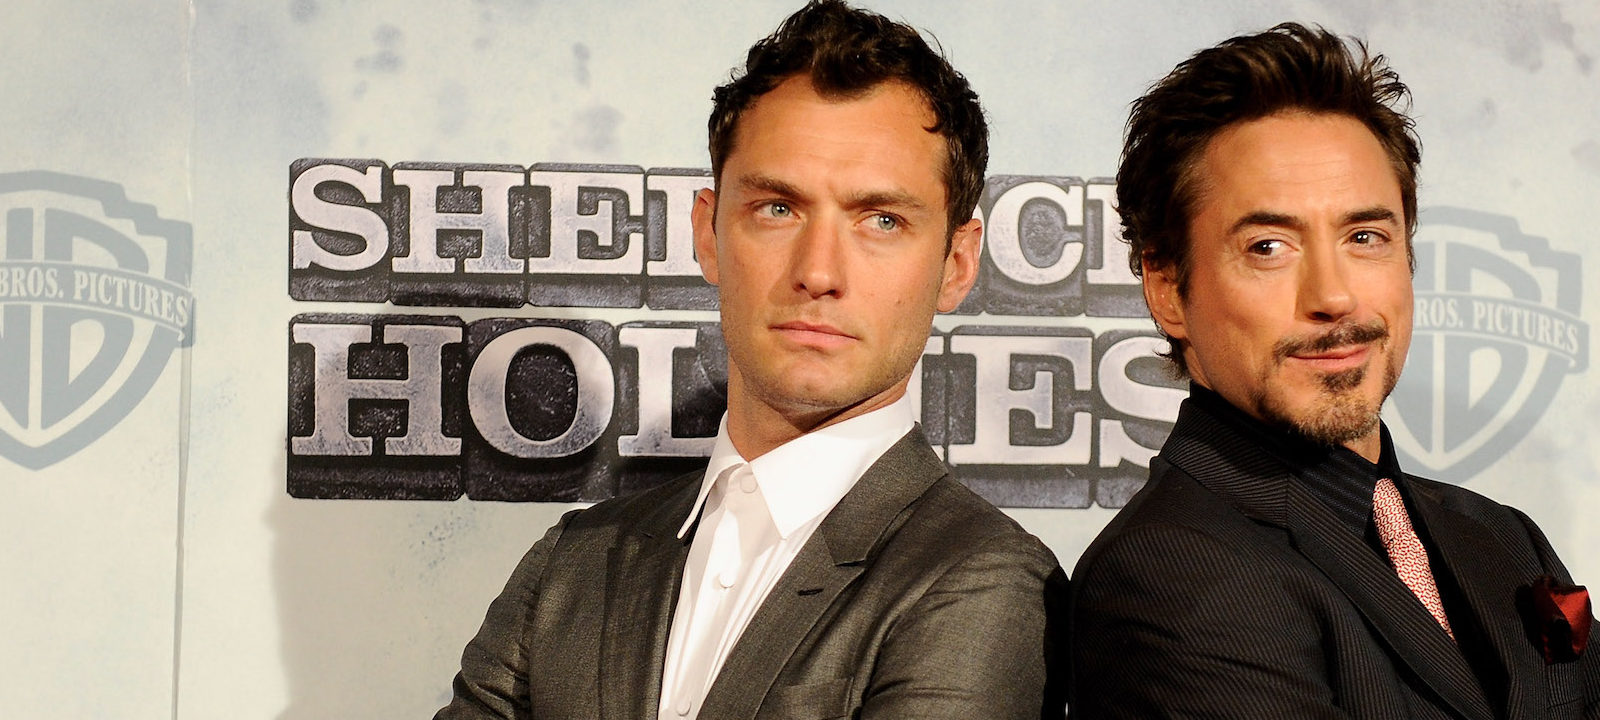 'Sherlock Holmes' Photocall in Madrid